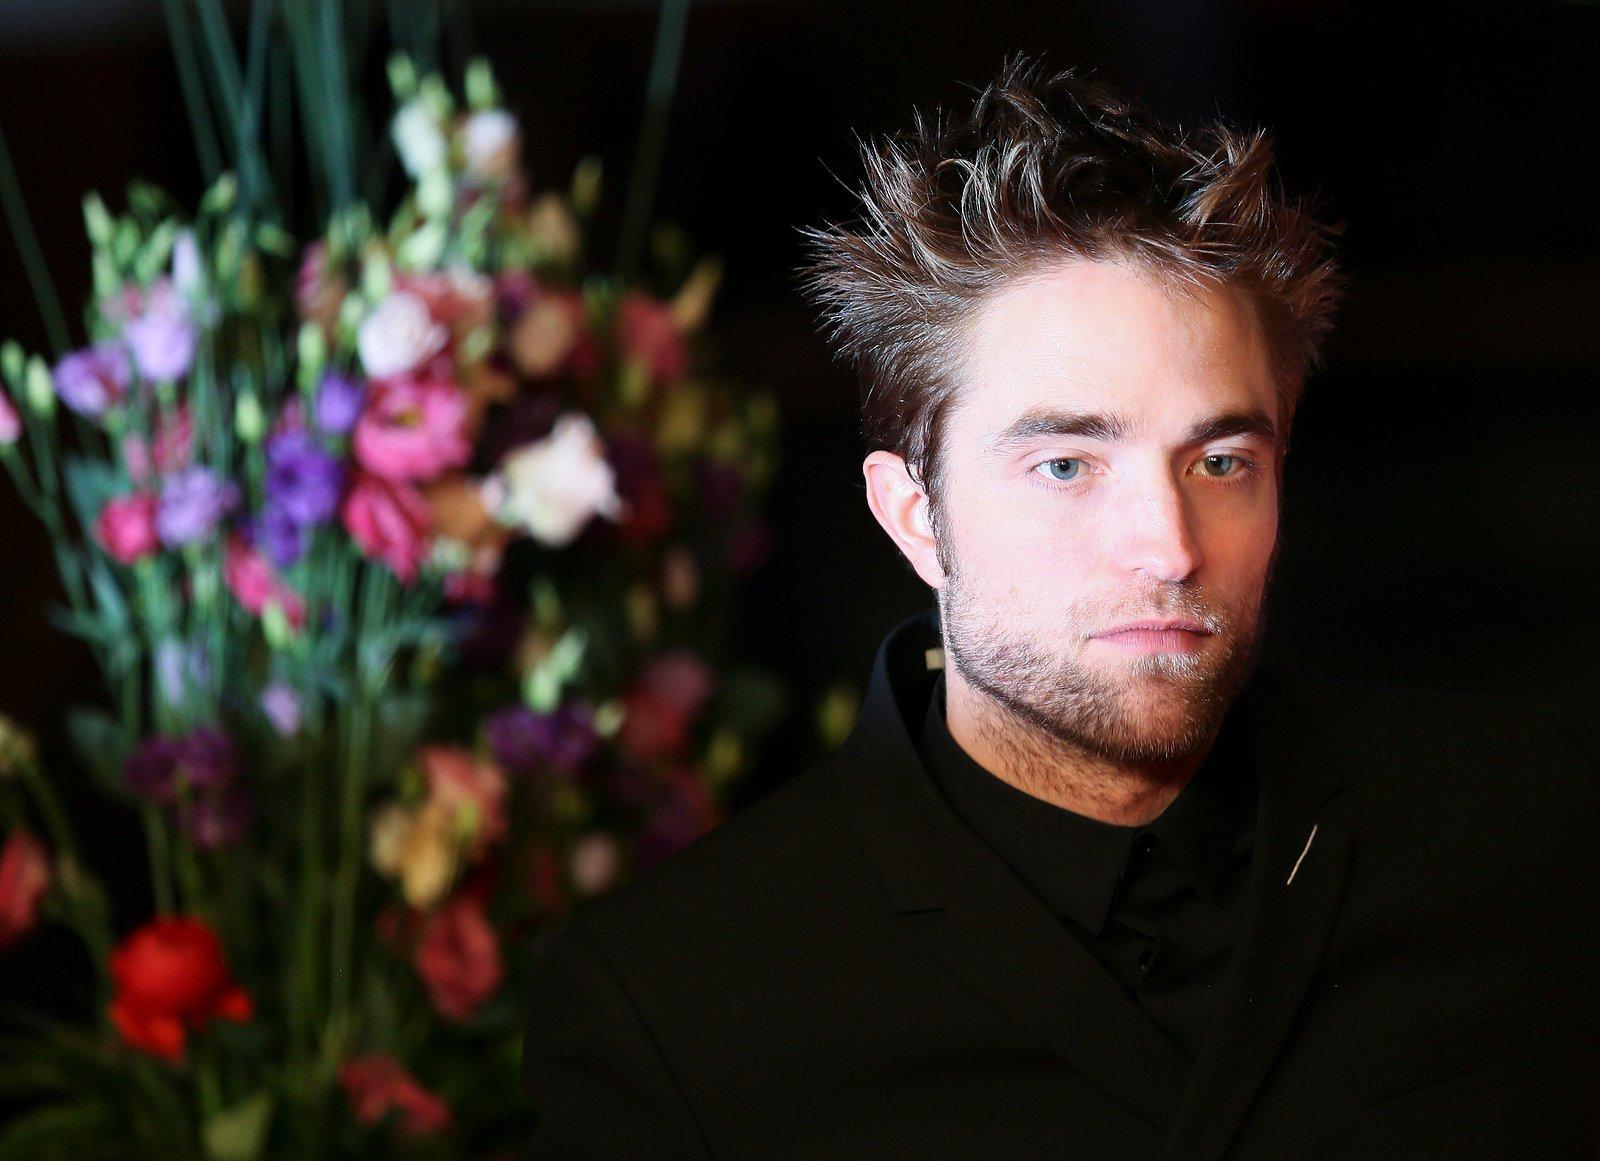 Robert Pattinson attends the Damsel premiere